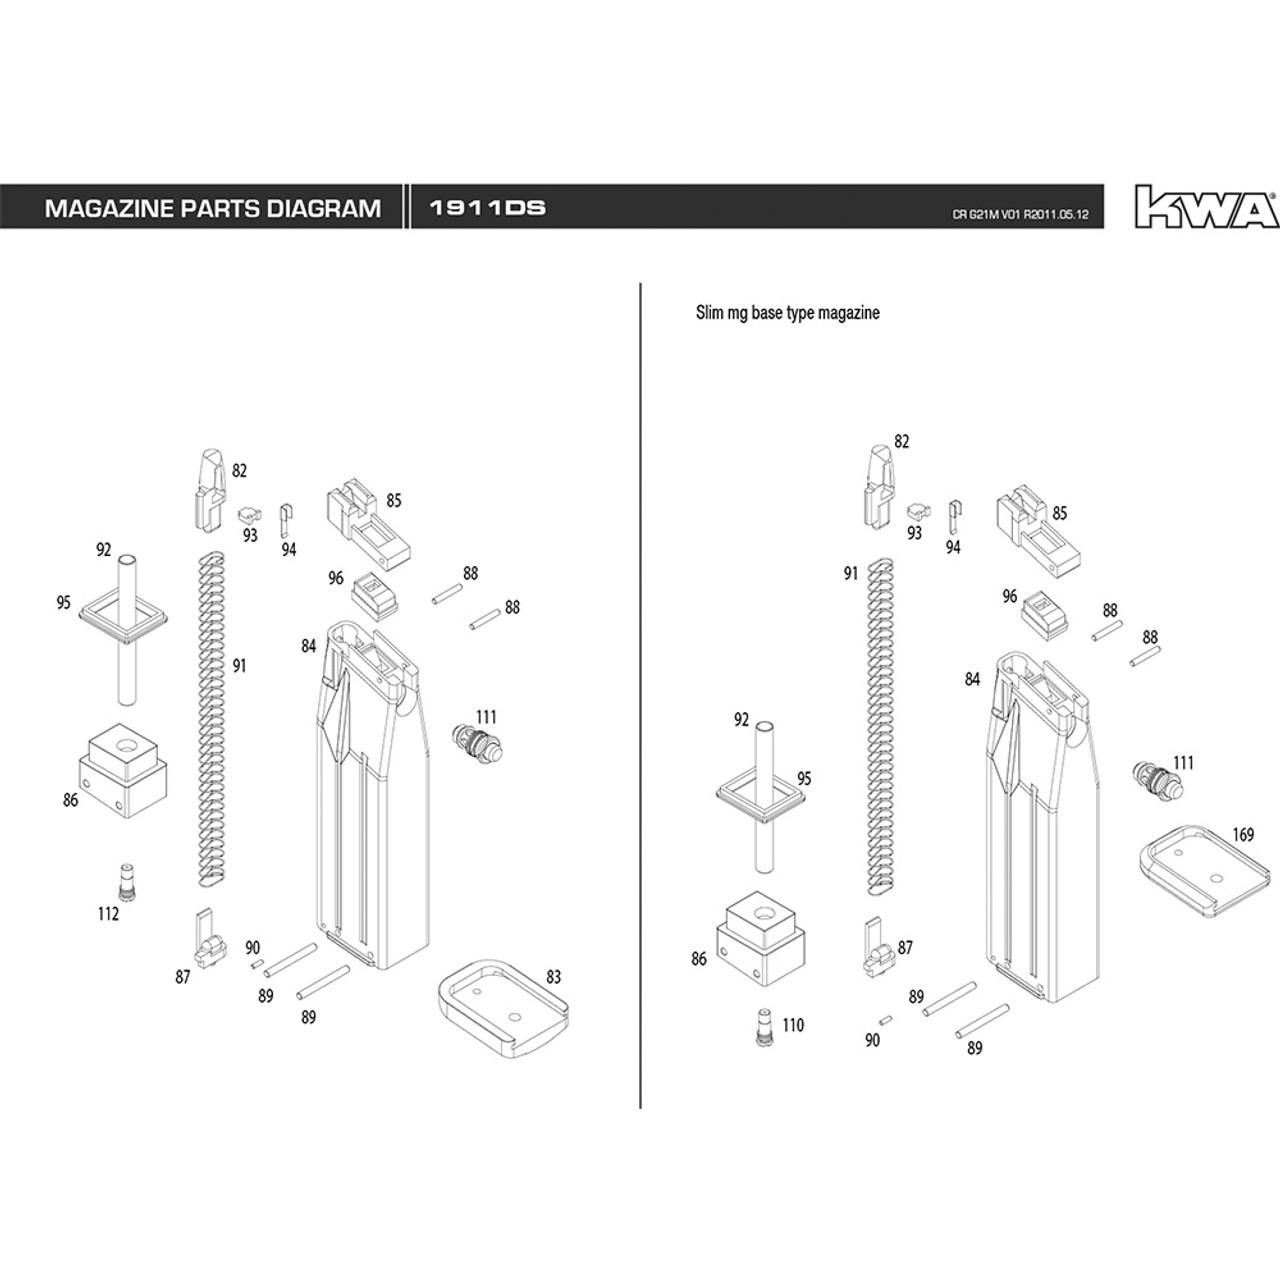 Kwa airsoft 1911 ds pistol magazine diagram mir tactical kwa airsoft 1911 ds pistol magazine diagram ccuart Gallery